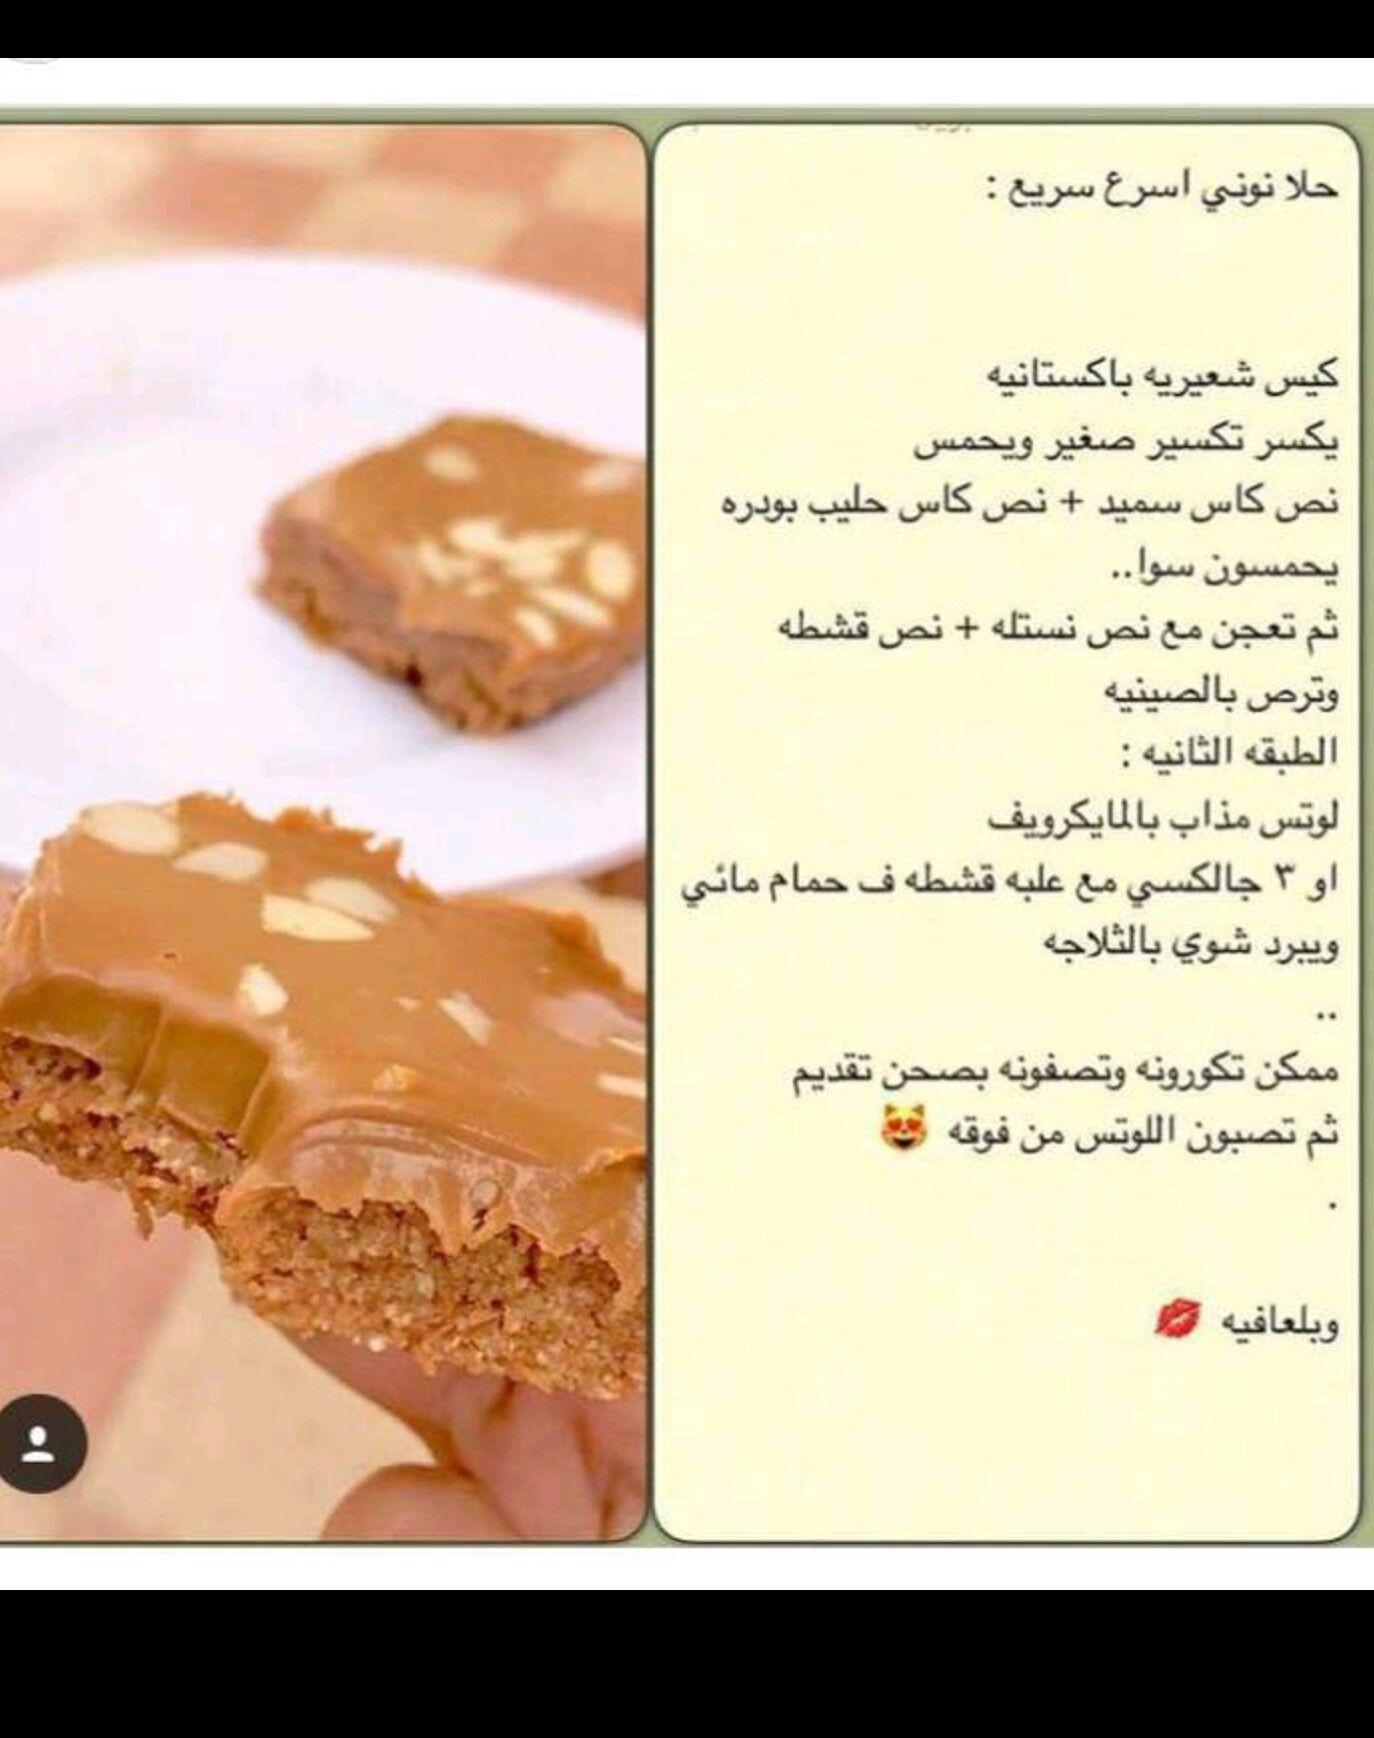 حلا سهل حلويات سويت حلا جالكسي حلا لوتس حلويات سهلة حلا سميد حلا كرات سهل حلا لذيذ وسهل Yummy Food Dessert Sweets Recipes Cooking Recipes Desserts